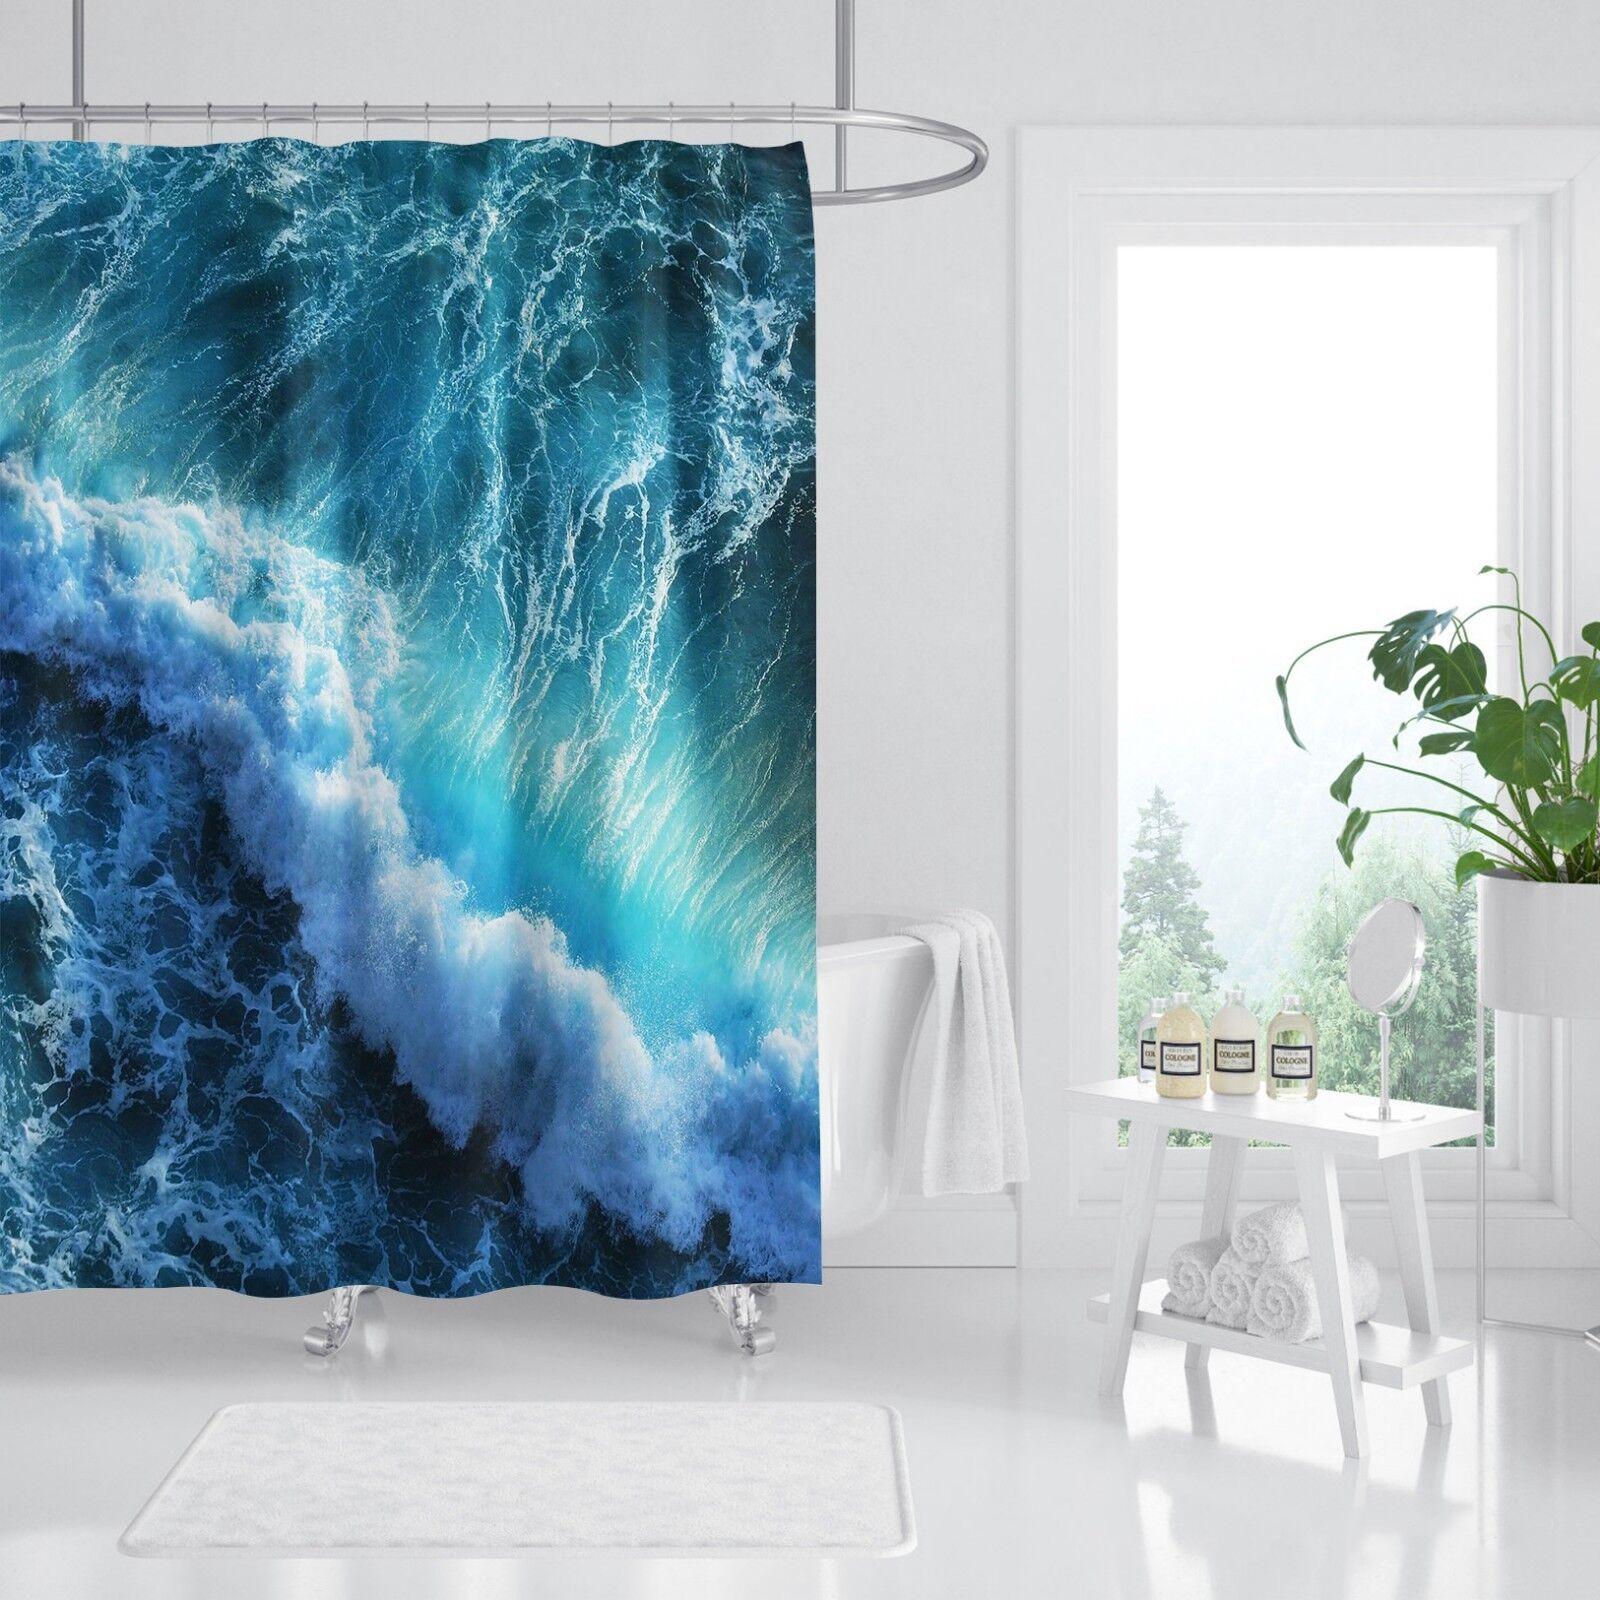 3D Sea Waves 46 Shower Curtain Waterproof Fiber Bathroom Home Windows Toilet